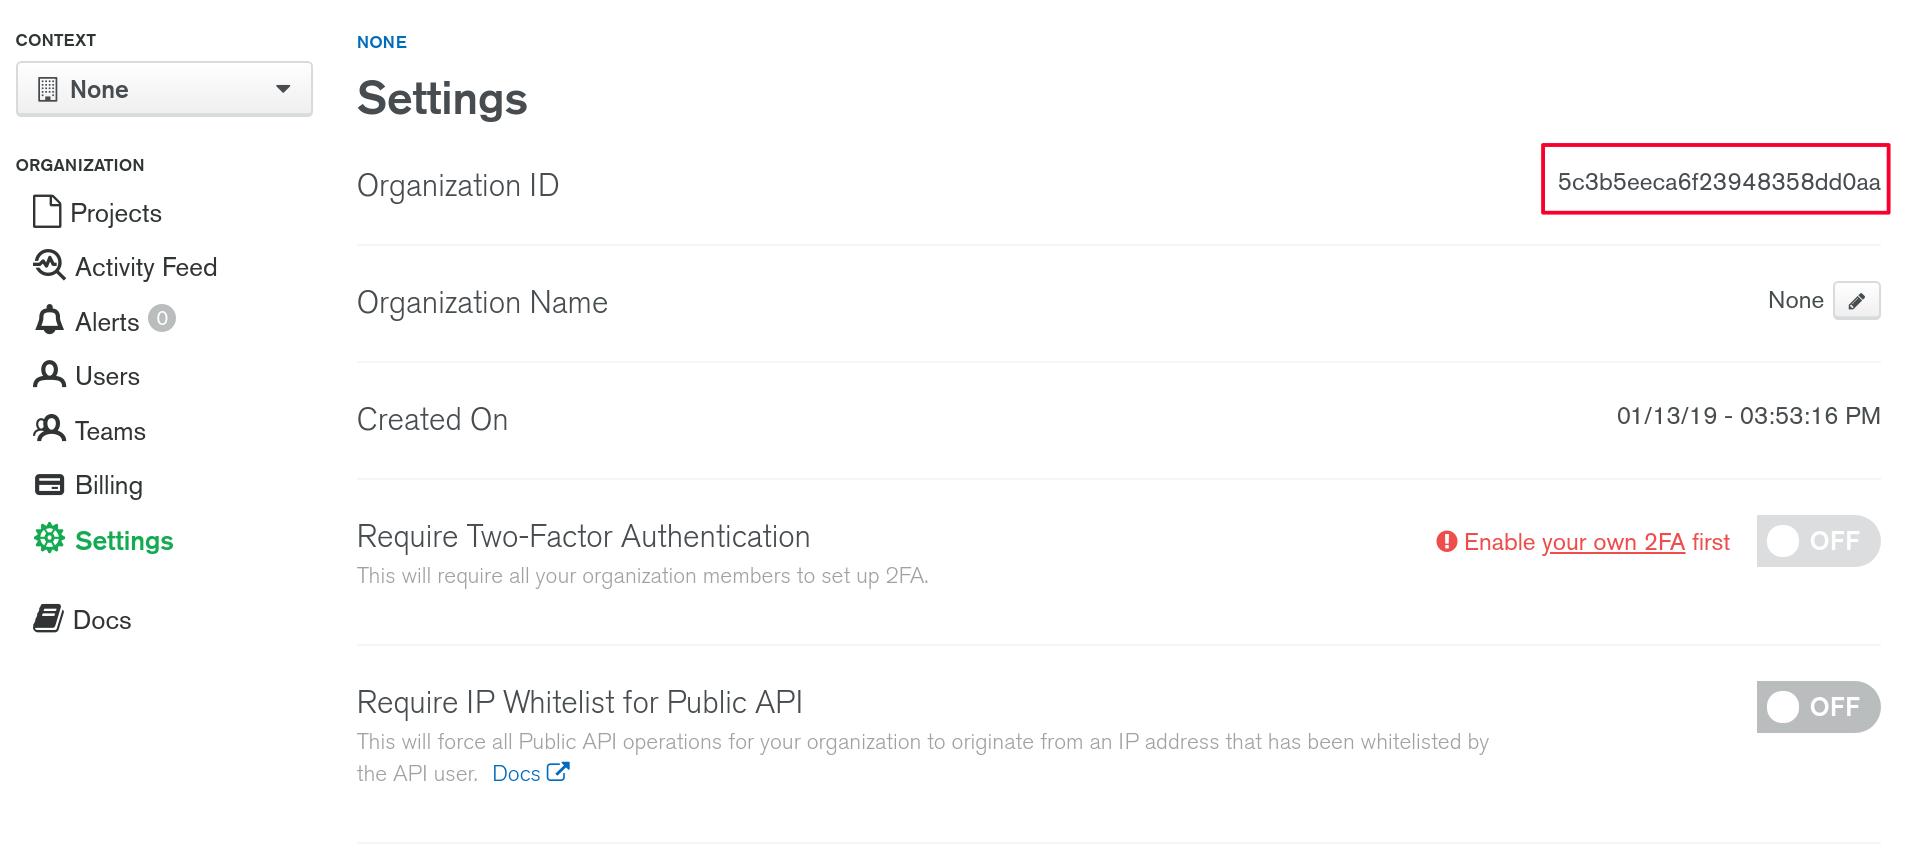 snow-dev com :: VPC Peering with MongoDB Atlas and AWS in